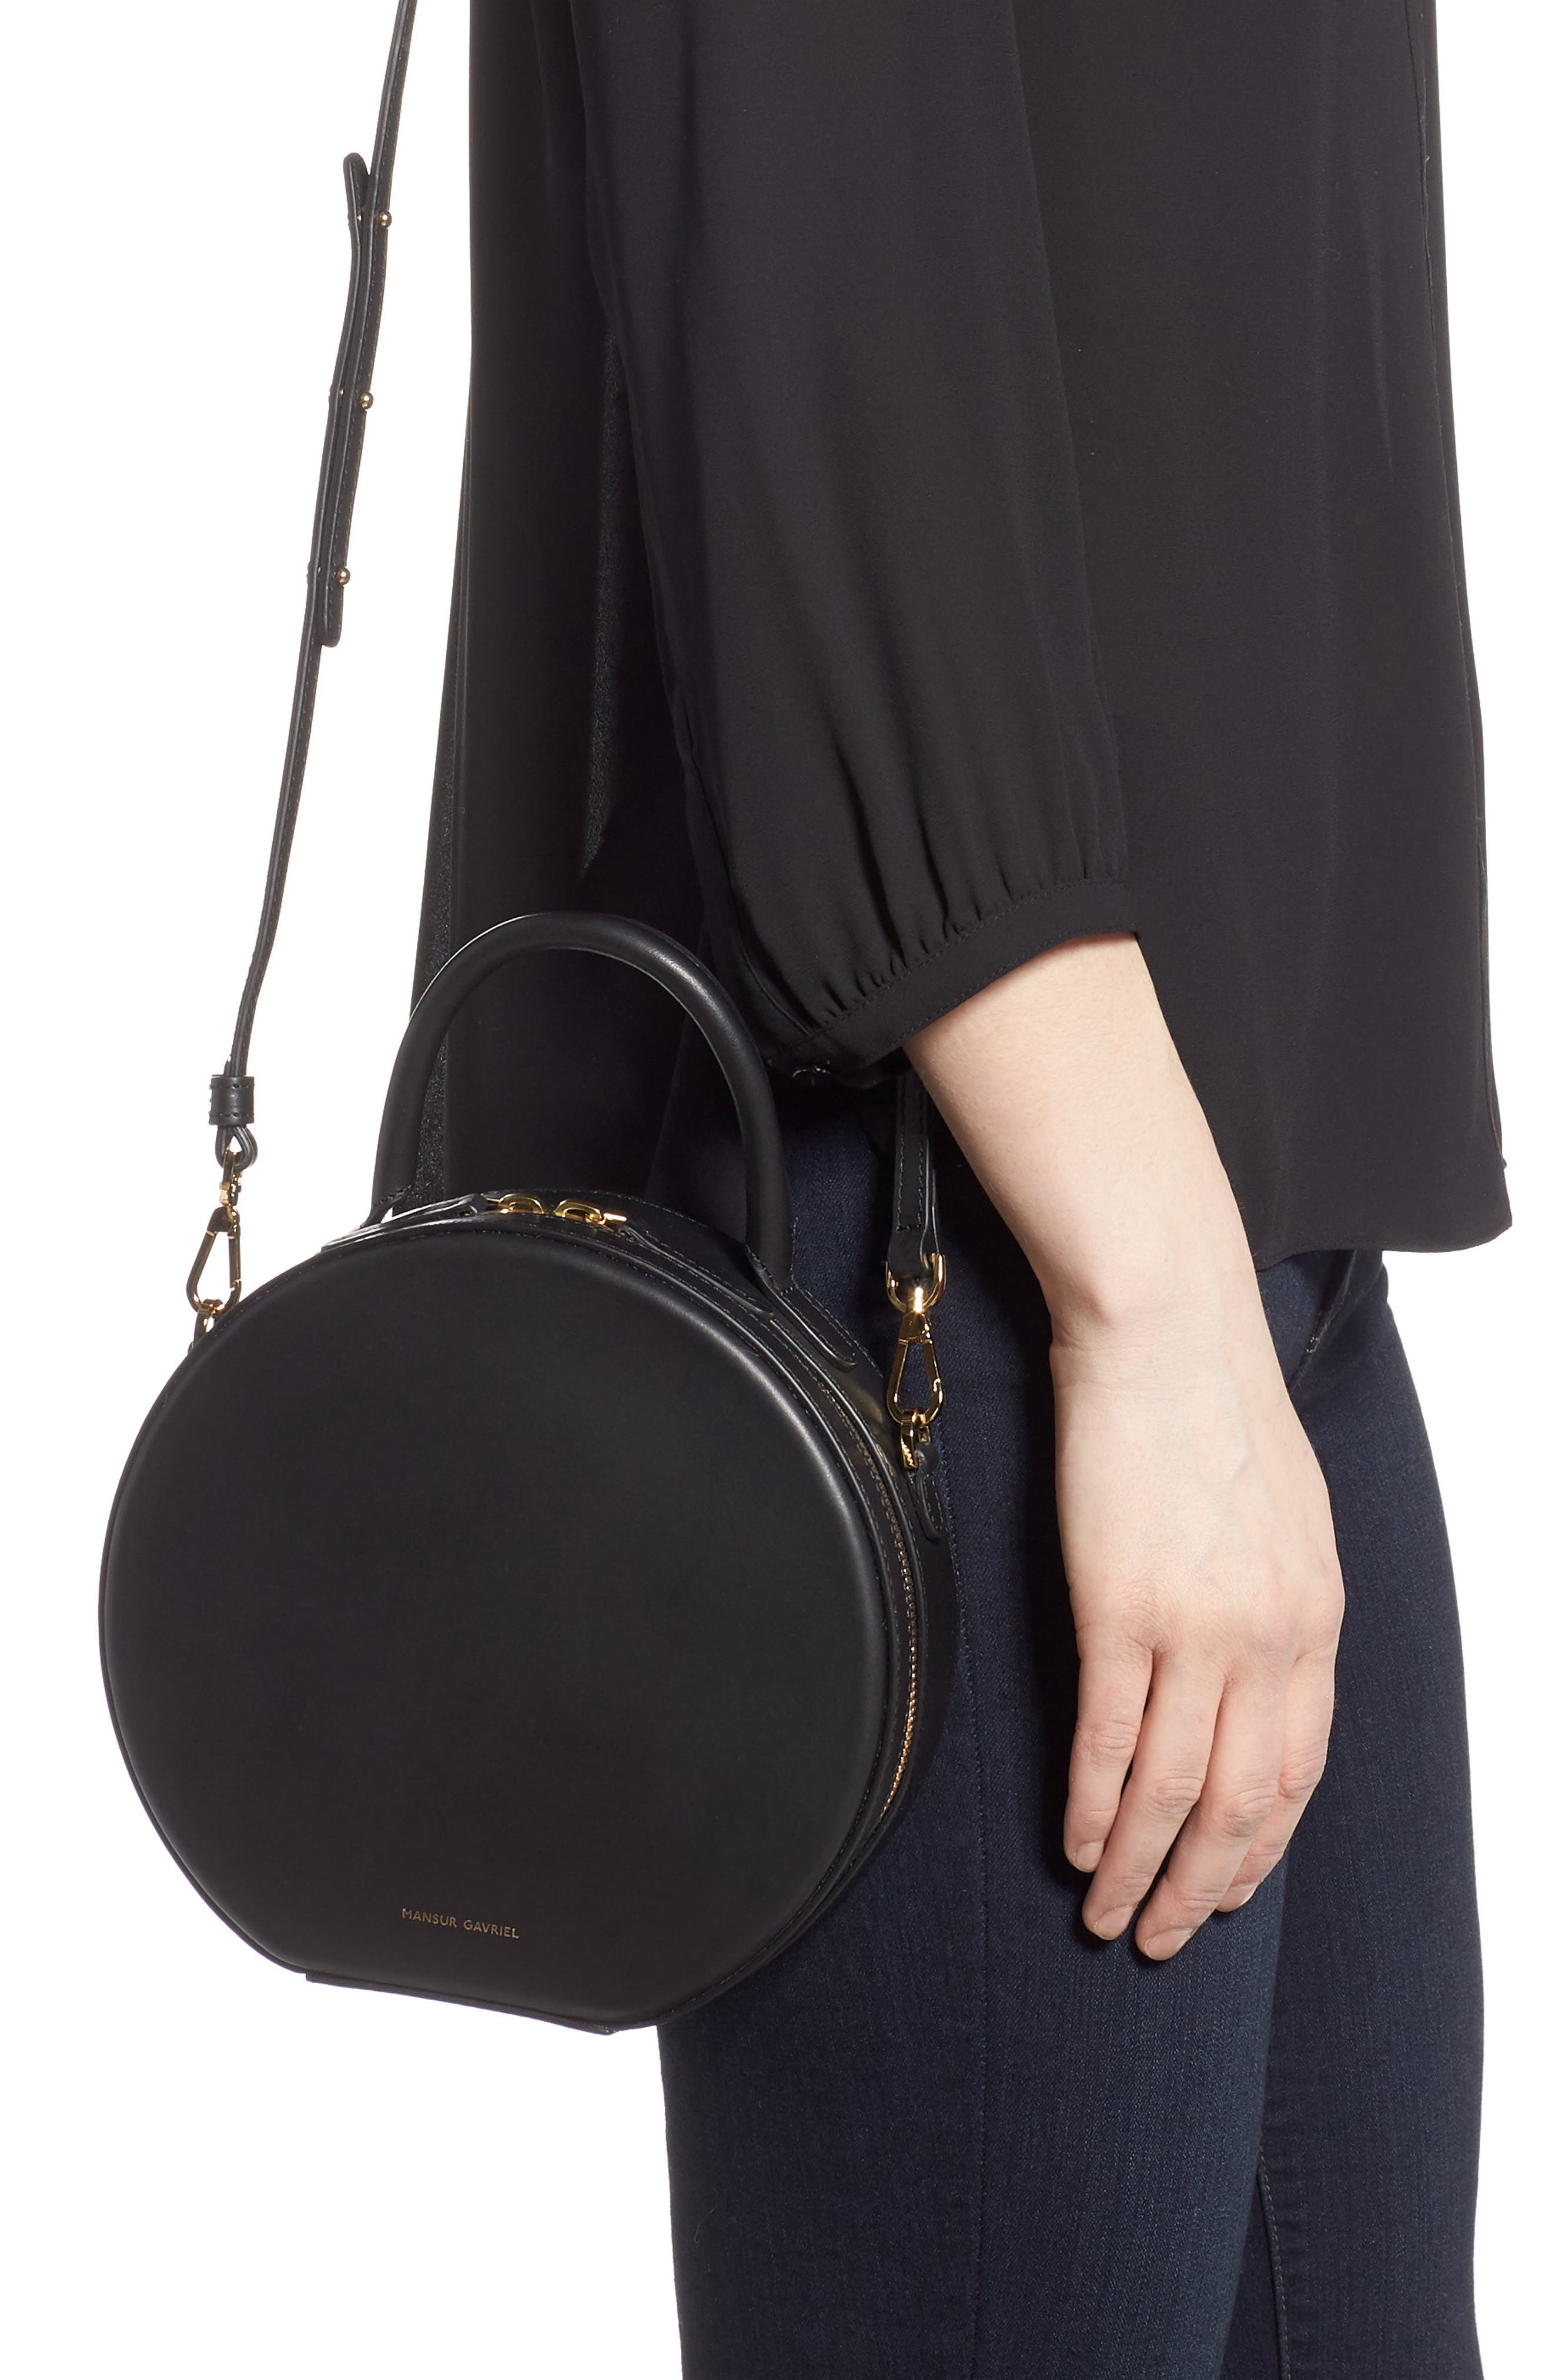 MANSUR GAVRIEL, Leather Circle Crossbody Bag, Alternate thumbnail 2, color, BLACK